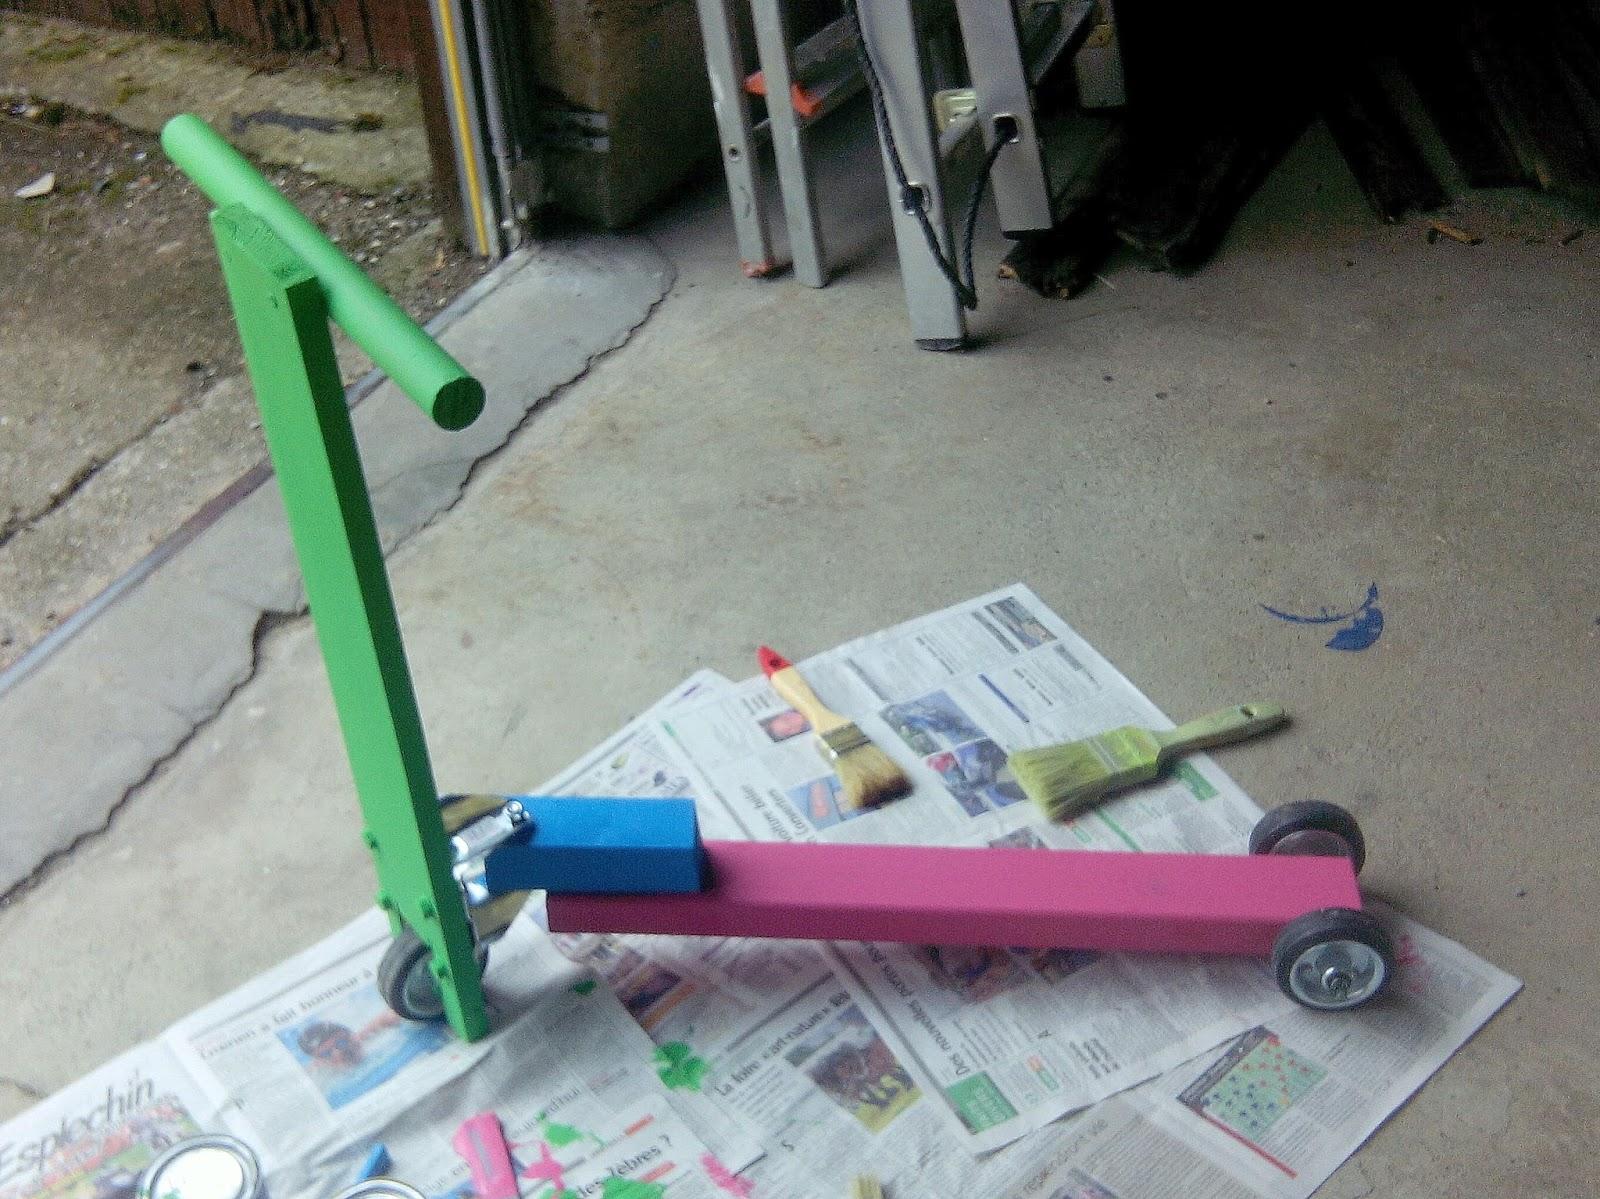 le blog du bricolage idiot trottinette enfant 3 roues. Black Bedroom Furniture Sets. Home Design Ideas